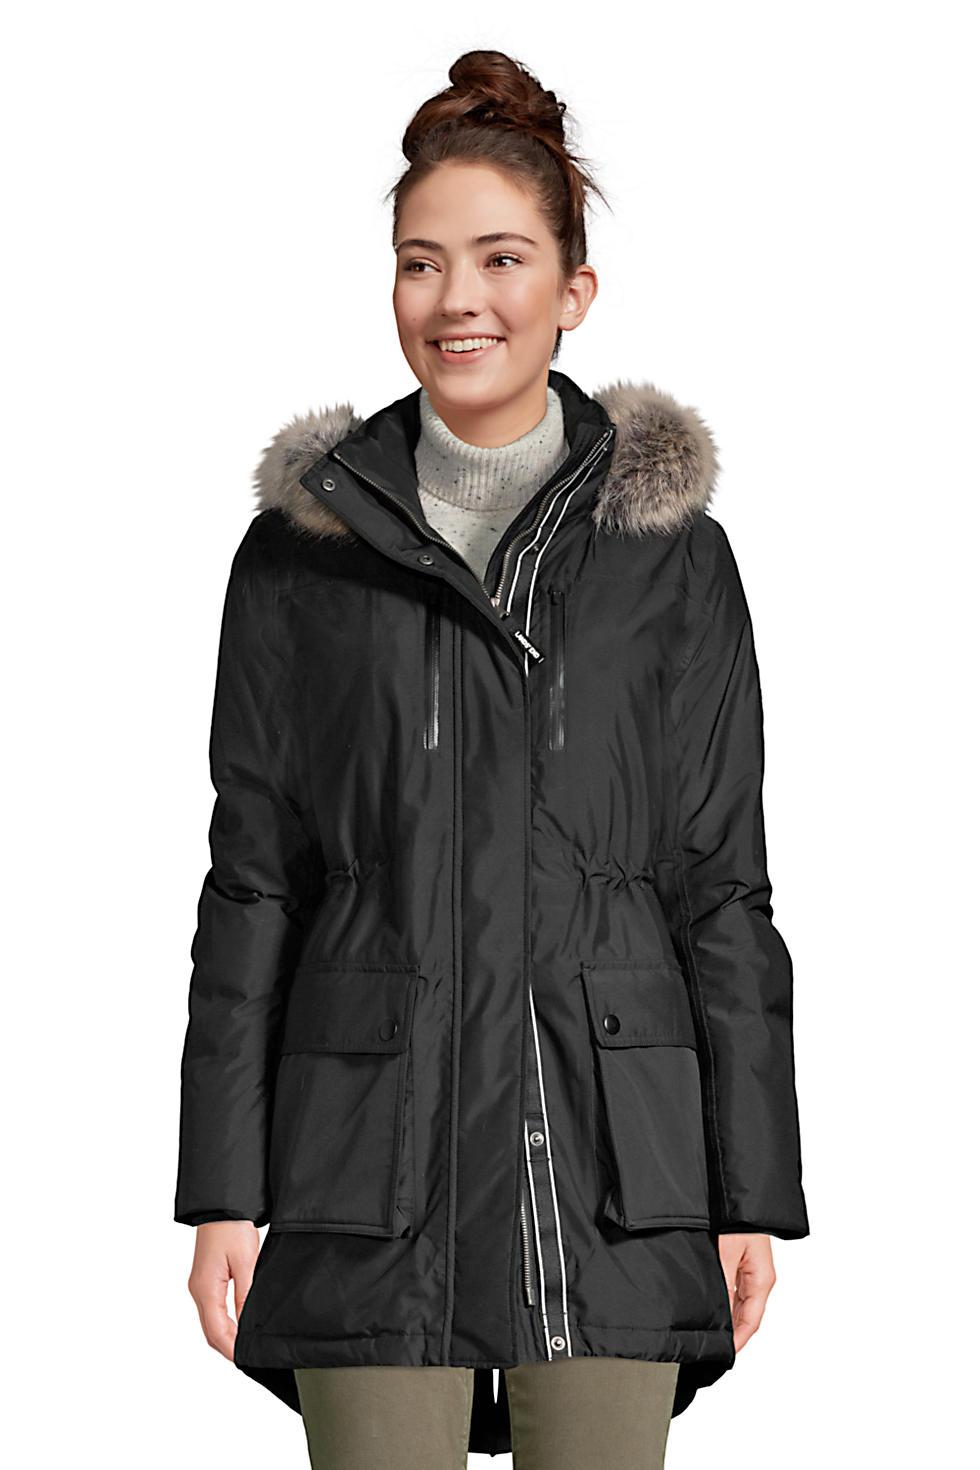 Shipping PENATE Winter Womens Mid-Length Warm Coat Hooded Long-Sleeved Jacket Slim Winter Lamb Wool Cotton Outwear Coats-U.S